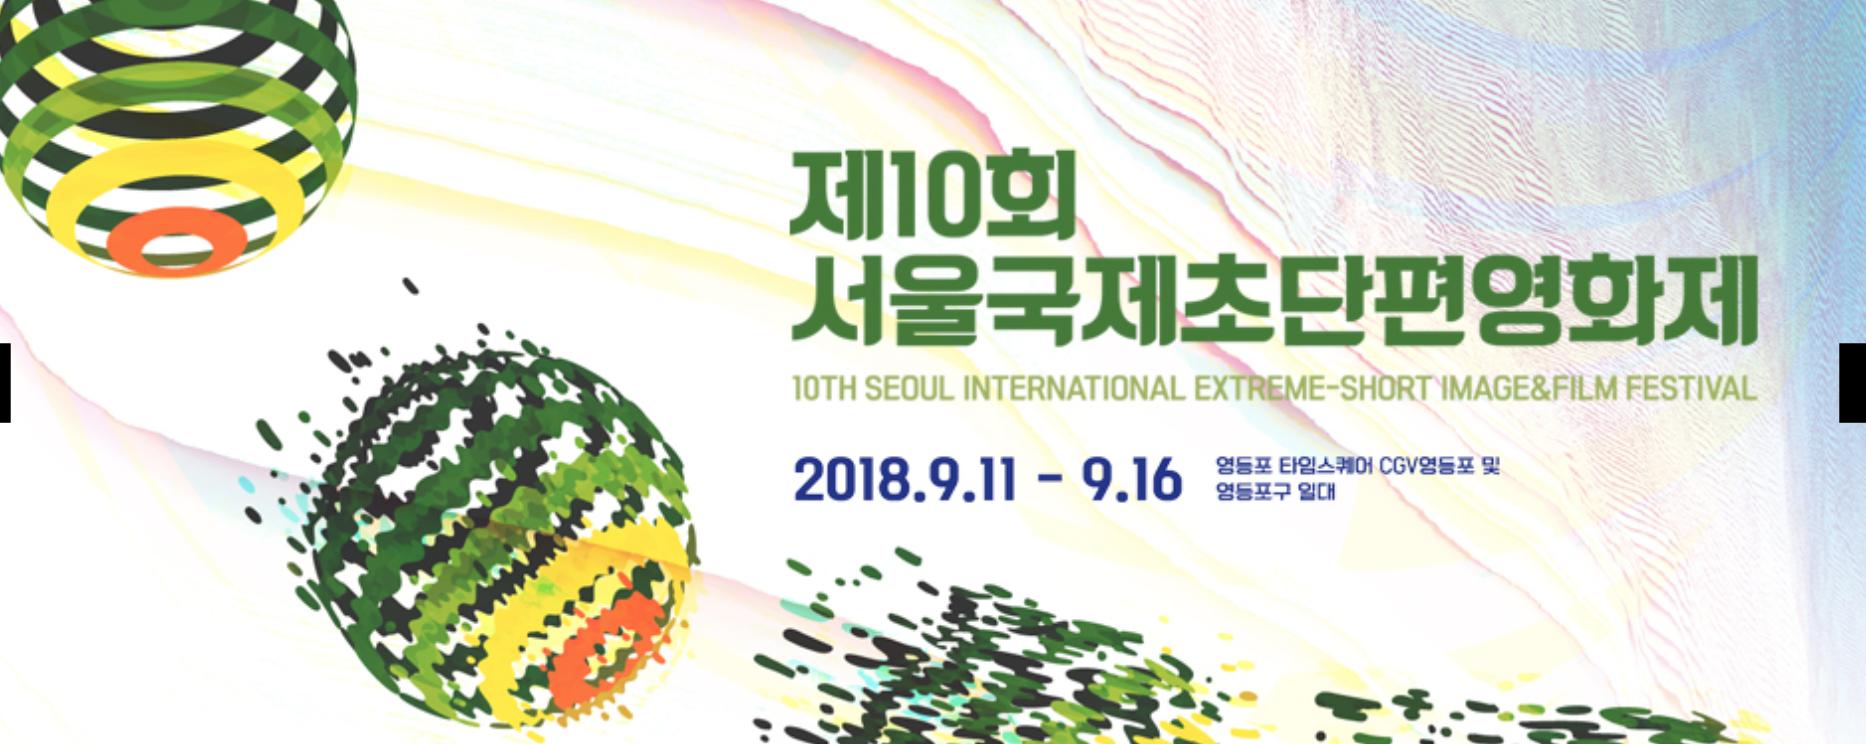 Festival in Seoul